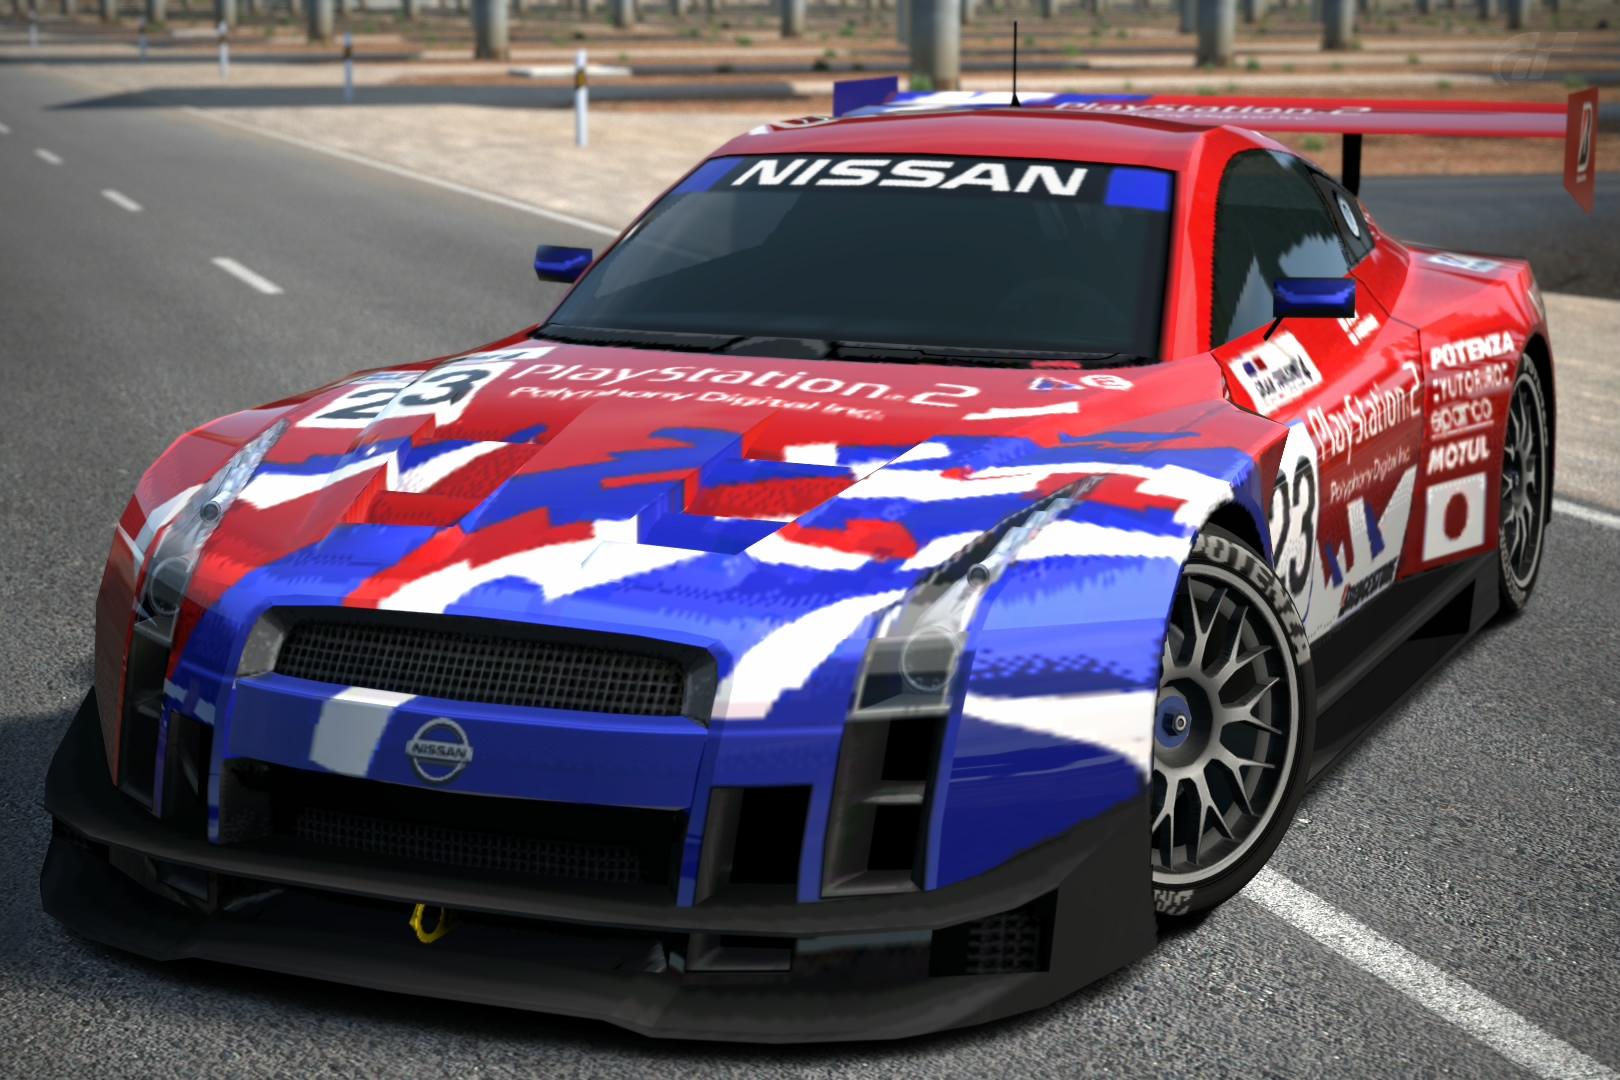 Nissan Race Car >> Nissan GT-R Concept LM Race Car | Gran Turismo Wiki